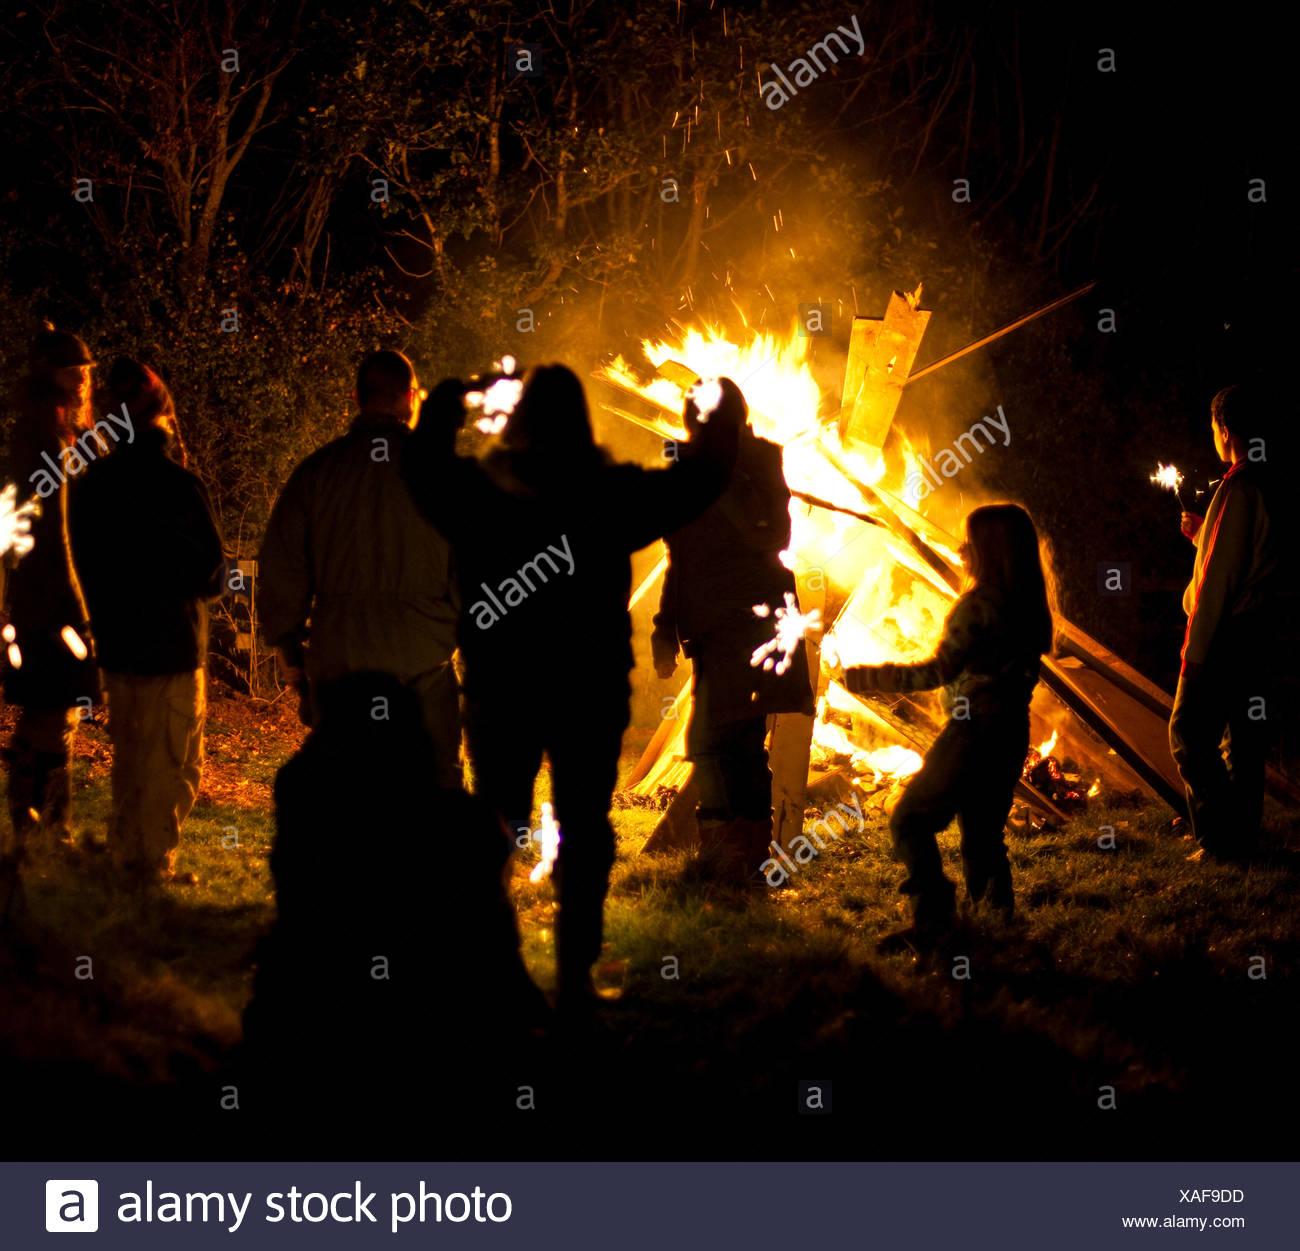 People on bonfire night - Stock Image